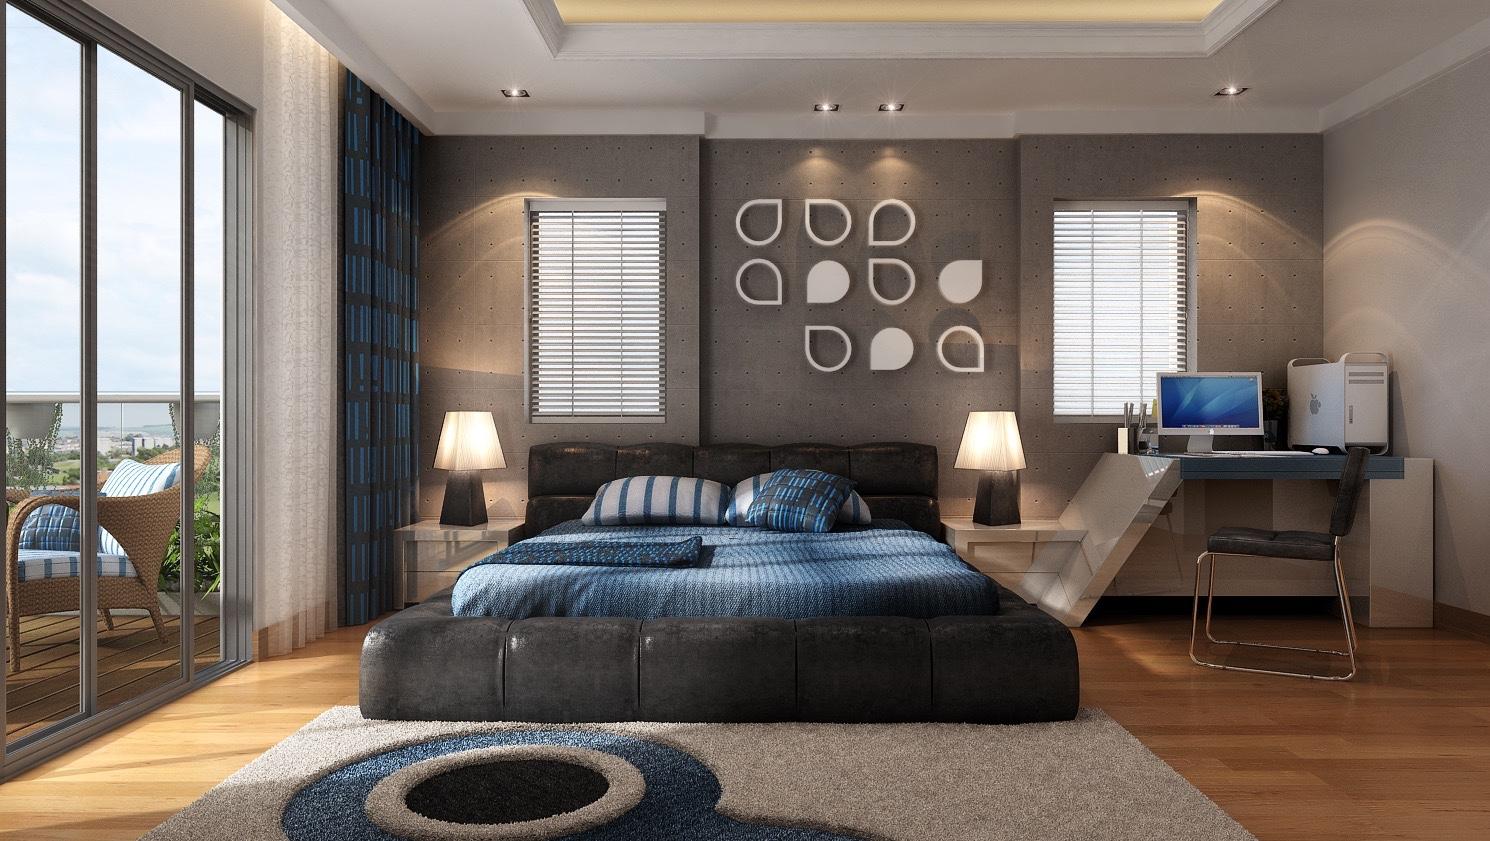 Download Room Design Bedroom Background